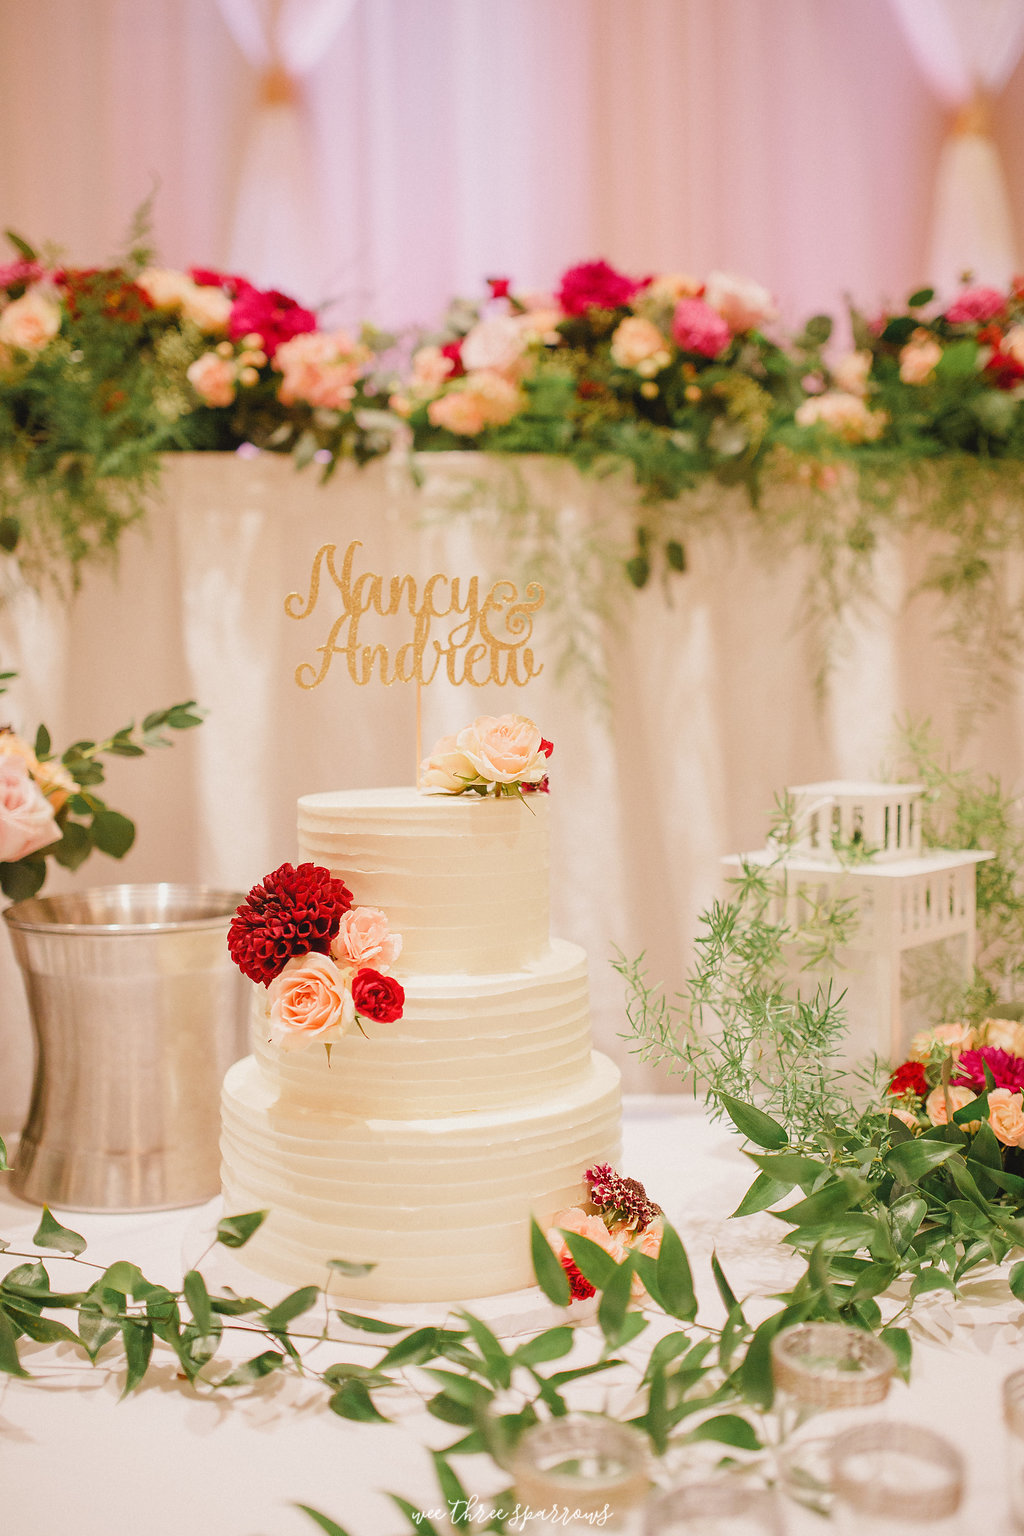 02.08-Aga-Khan-Museum-Wedding-Photos-Toronto-Wedding-Toronto-Wedding-Photographer-Wee-Three-Sparrows-Photography_38.jpg